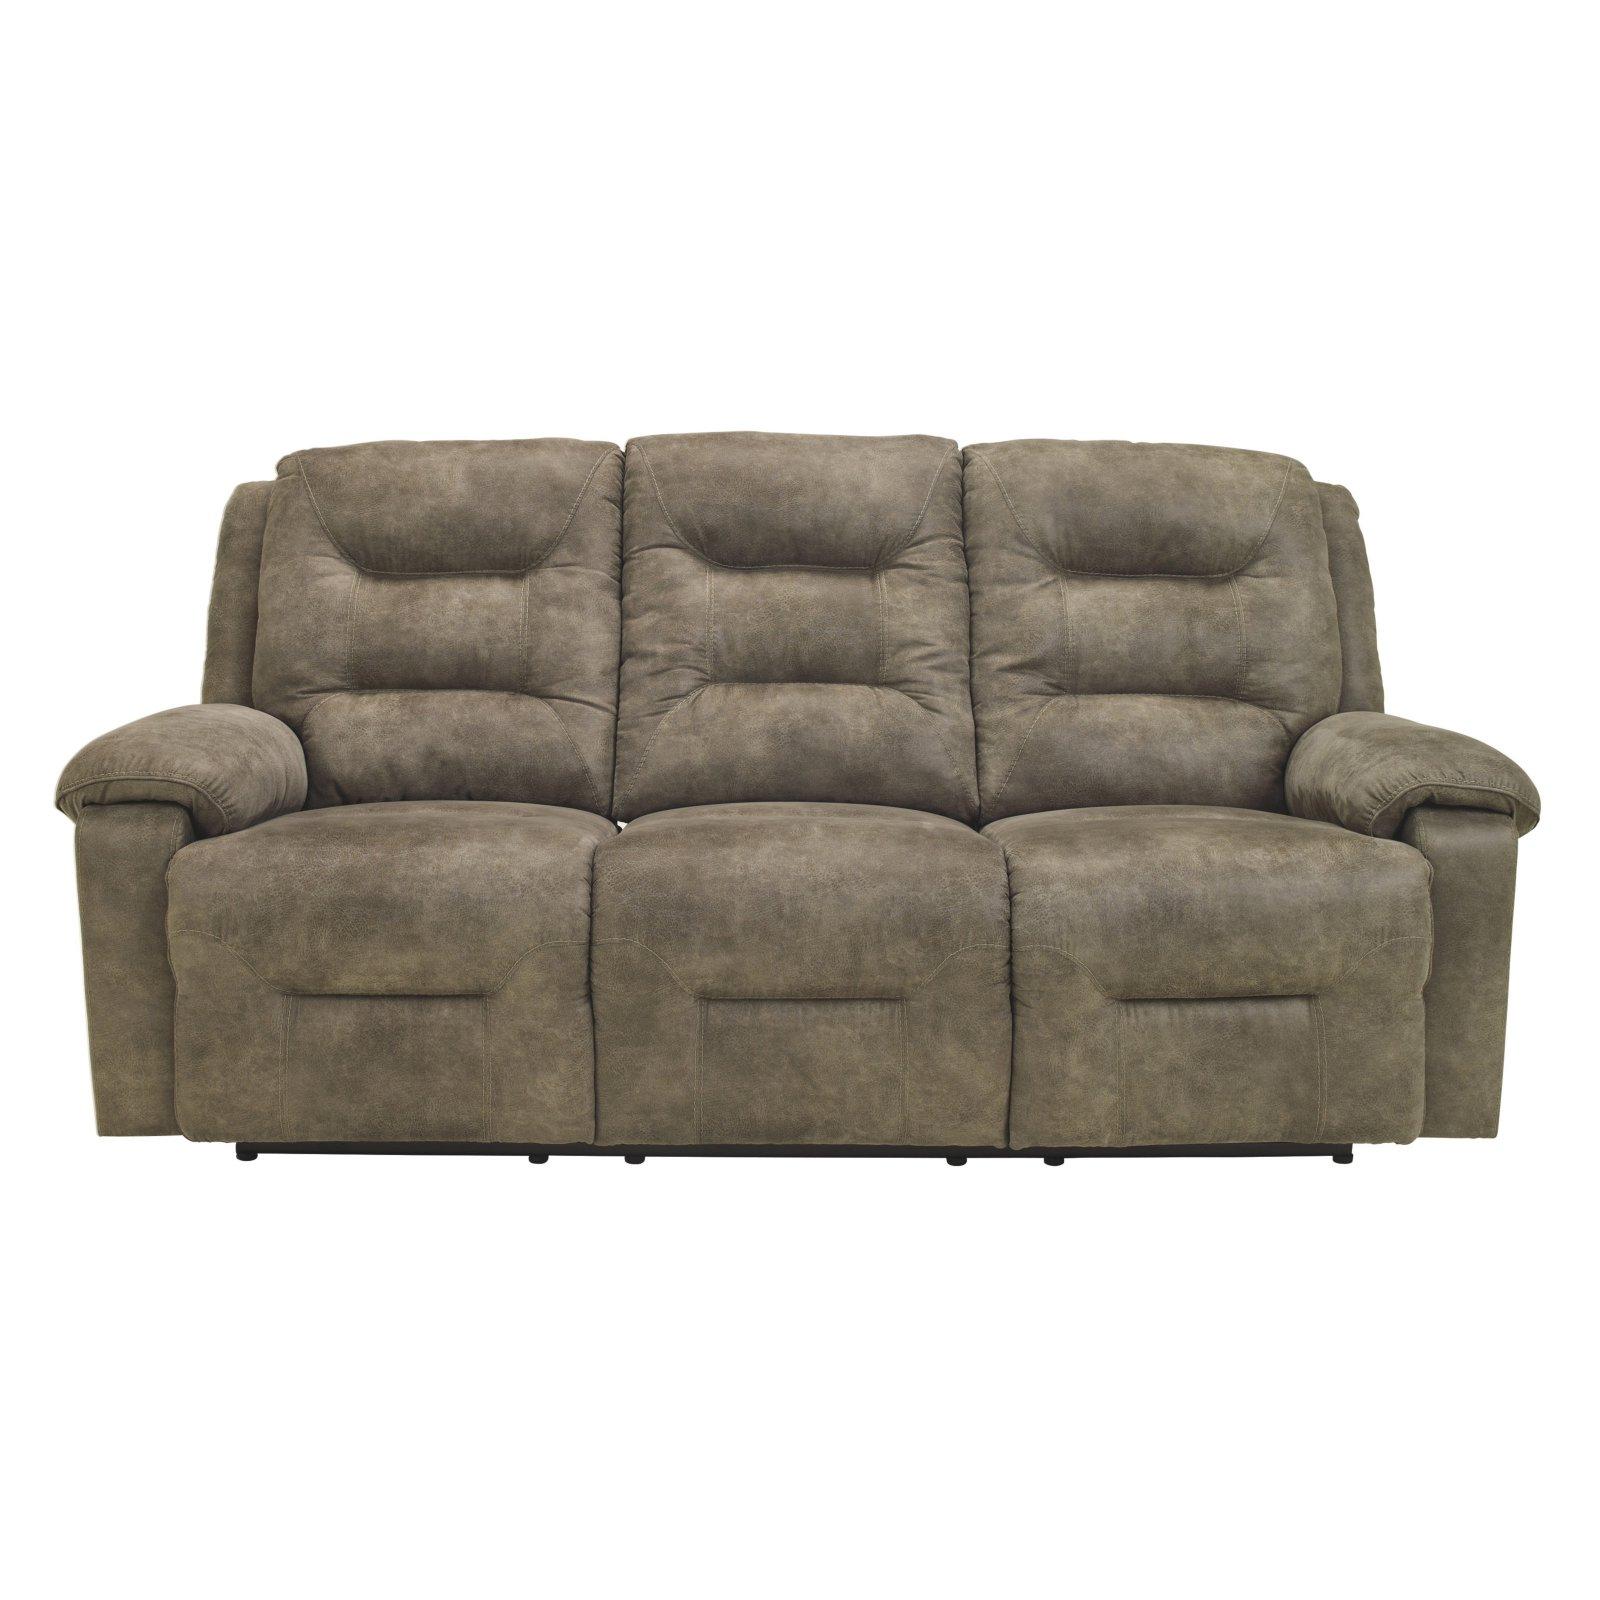 Signature Design by Ashley Rotation Reclining Power Sofa